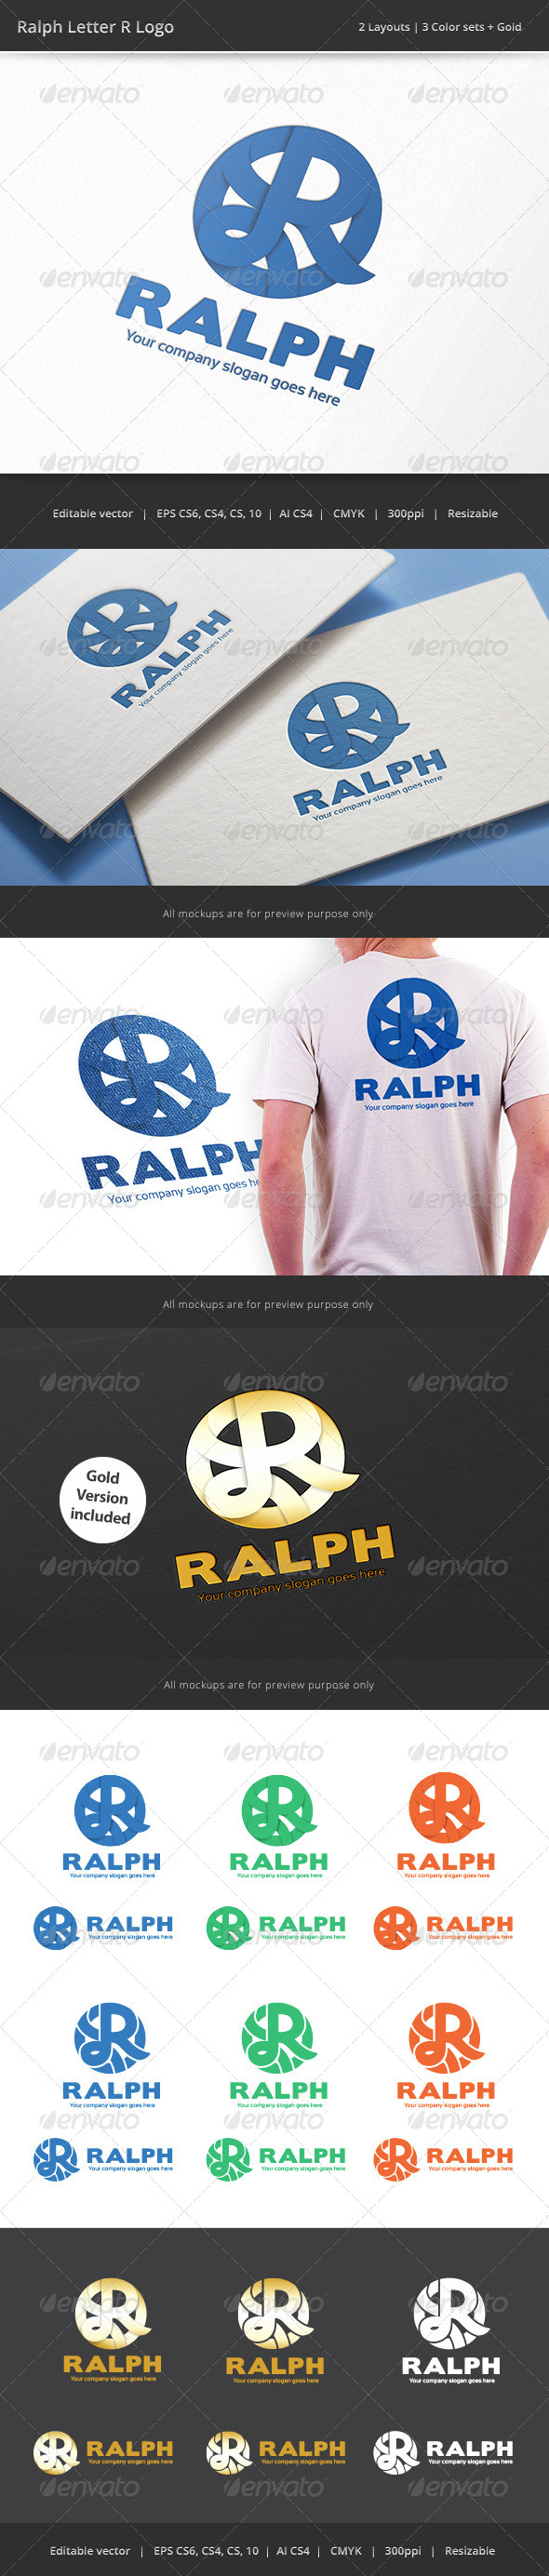 GraphicRiver Ralph Letter R Logo 8048753